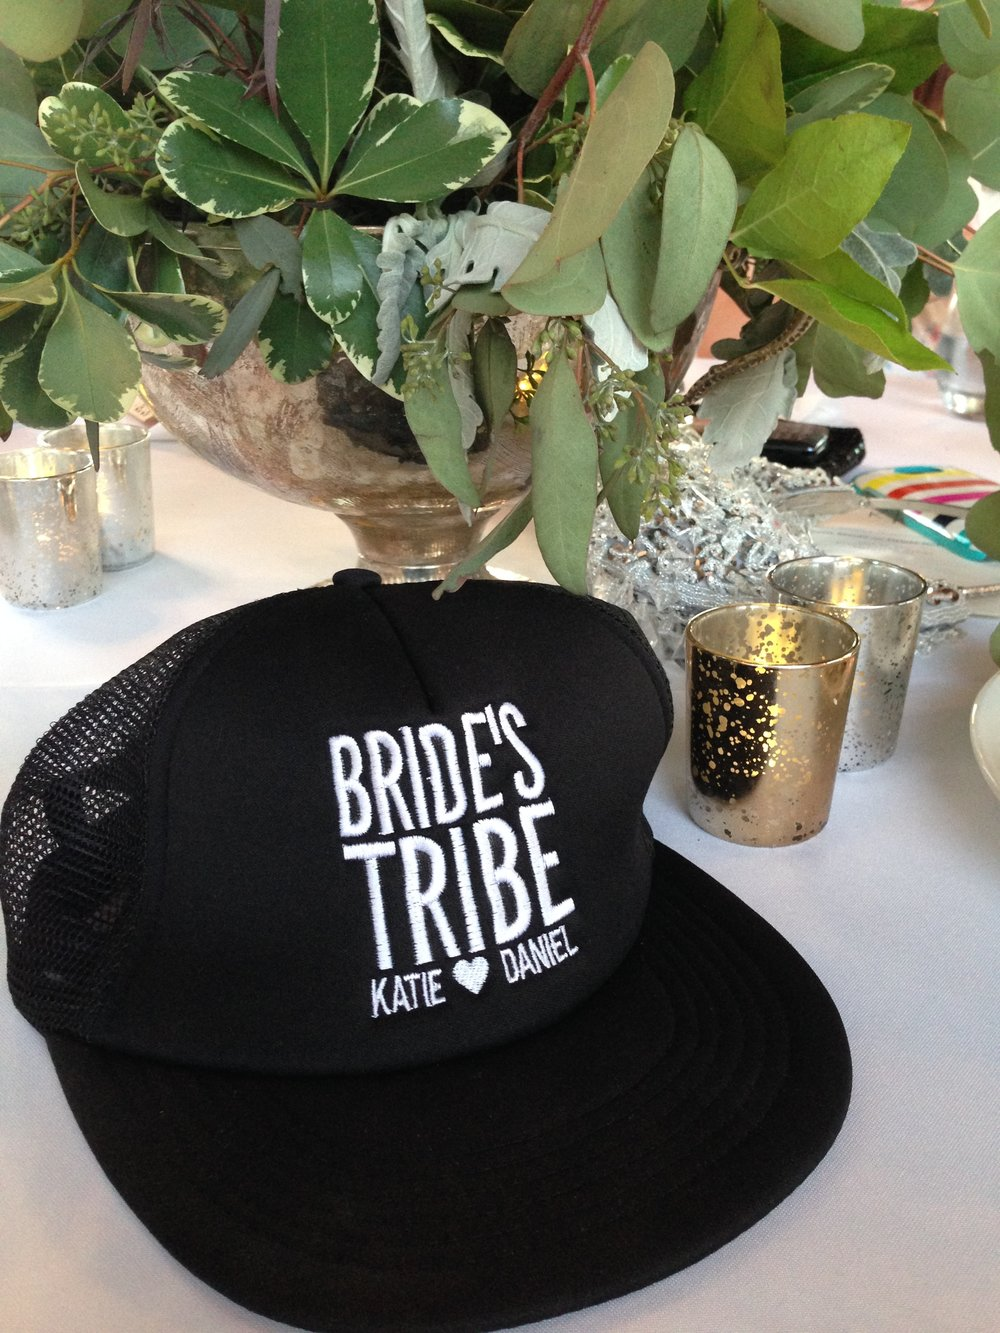 Bride's Tribe! I love my sweet friends: Katie & Daniel, Maddy & Brodie.